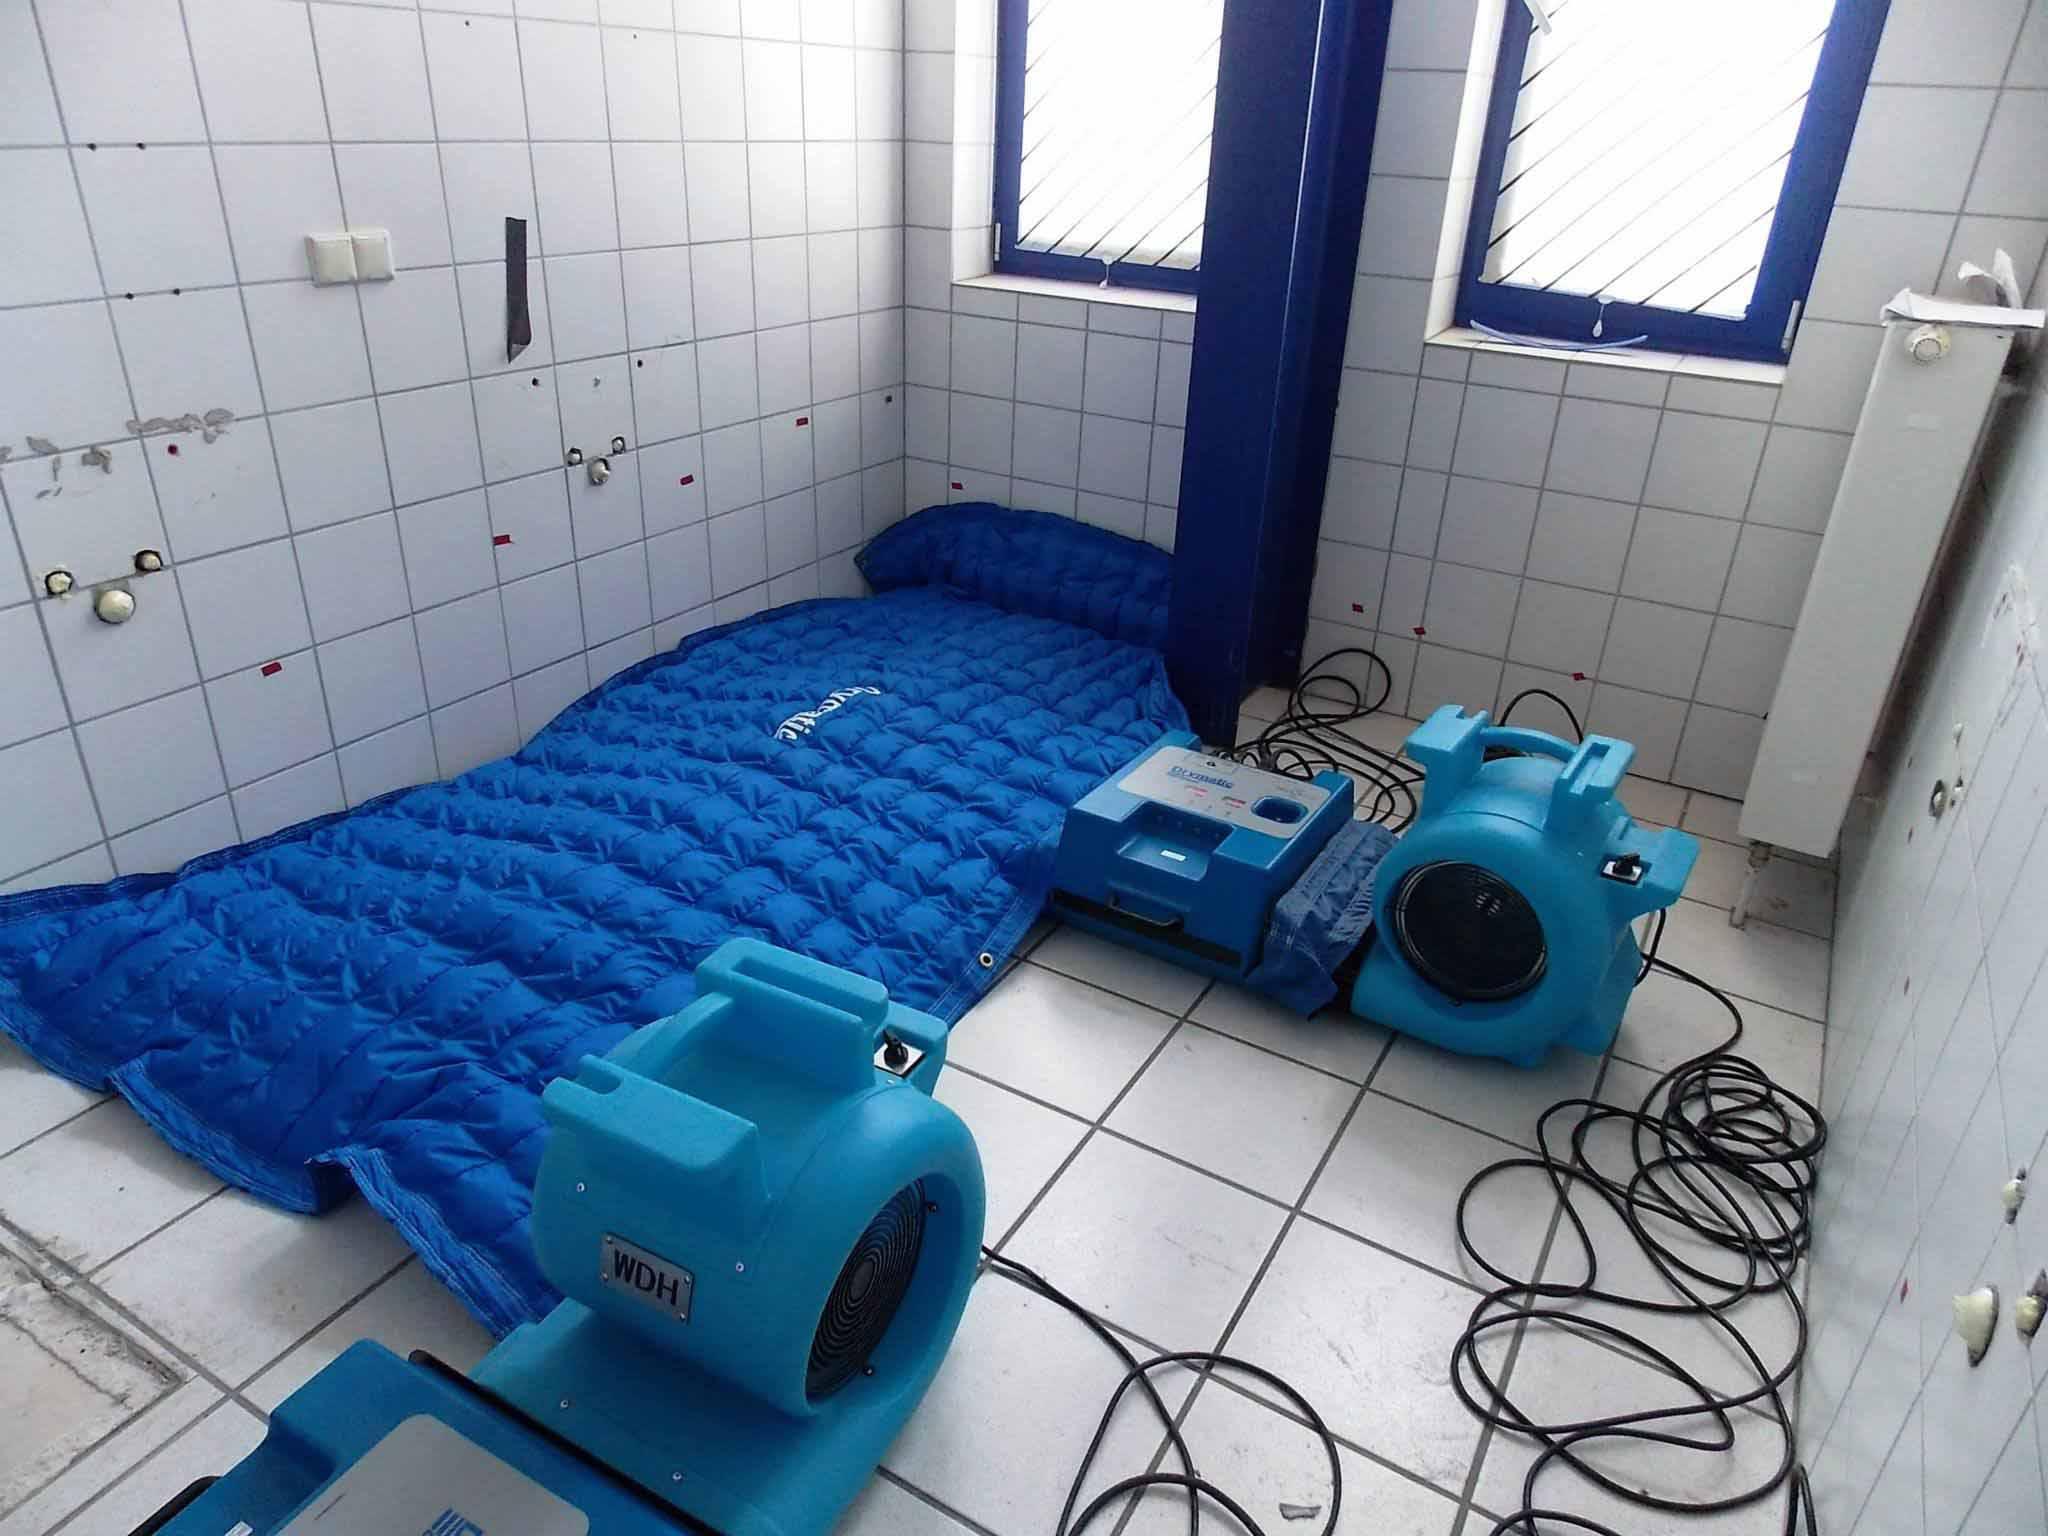 Drymatic Floor Mats13.jpg